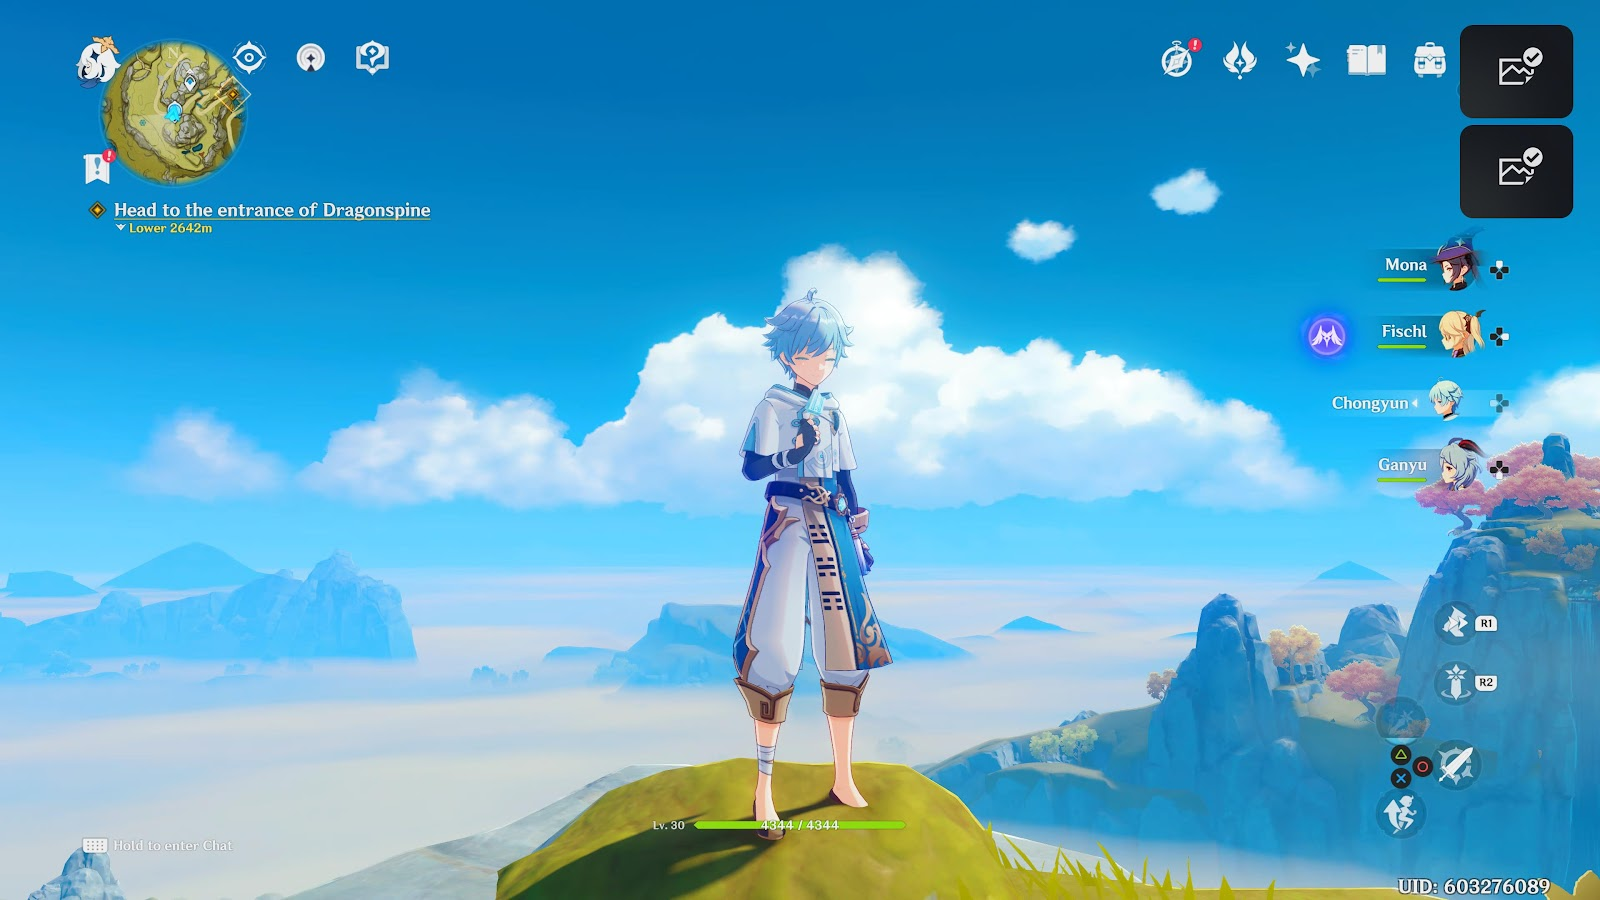 chongyun looks over a mountain